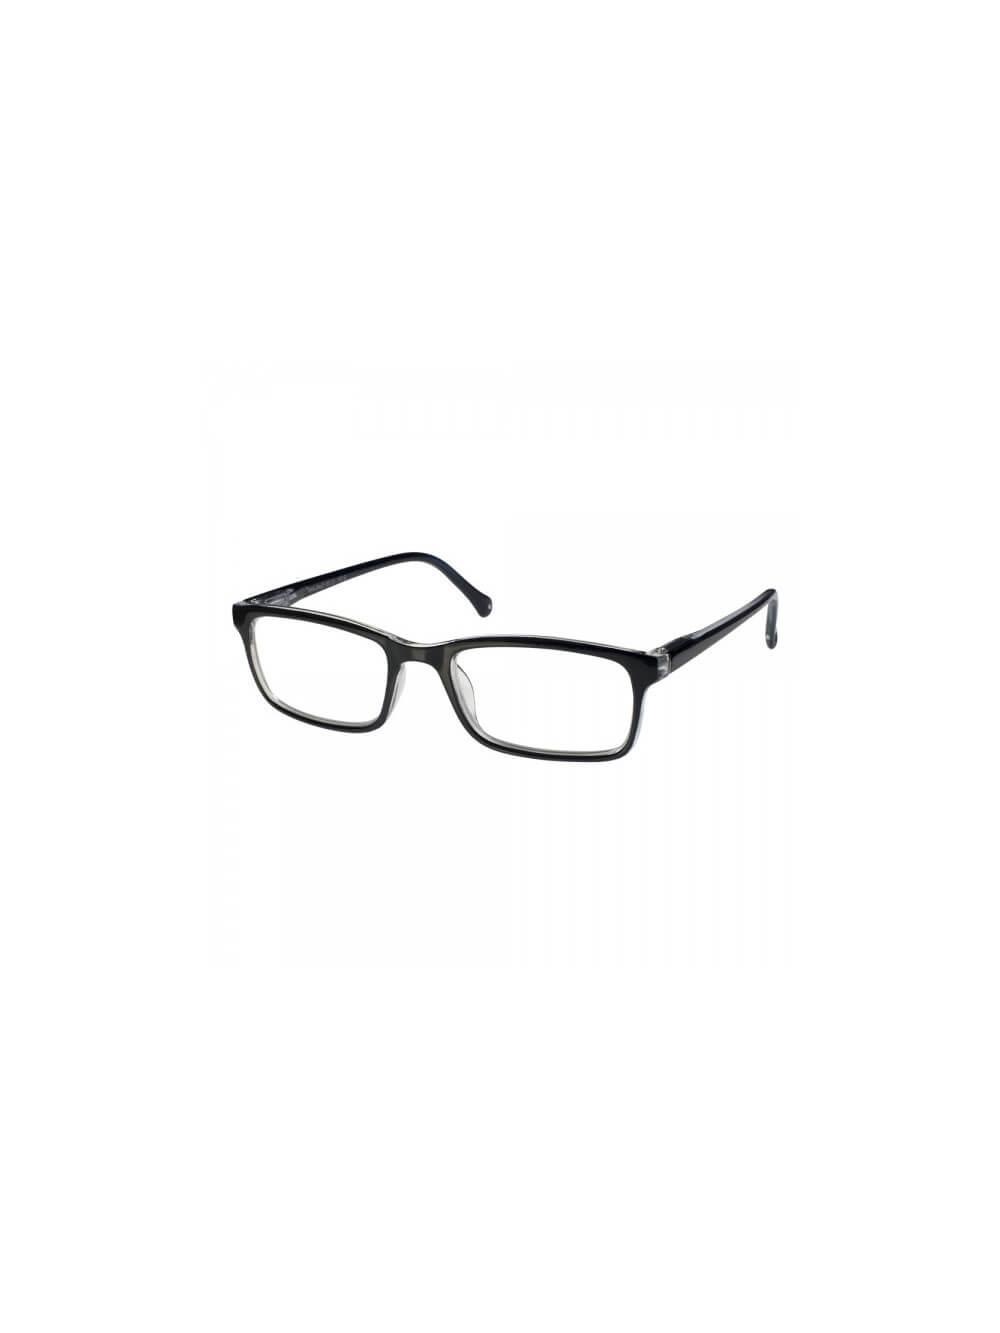 Vitorgan EyeLead Unisex Γυαλιά Πρεσβυωπίας Κοκάλινο Μαύρο Χρώμα ... d3b37d2b42f